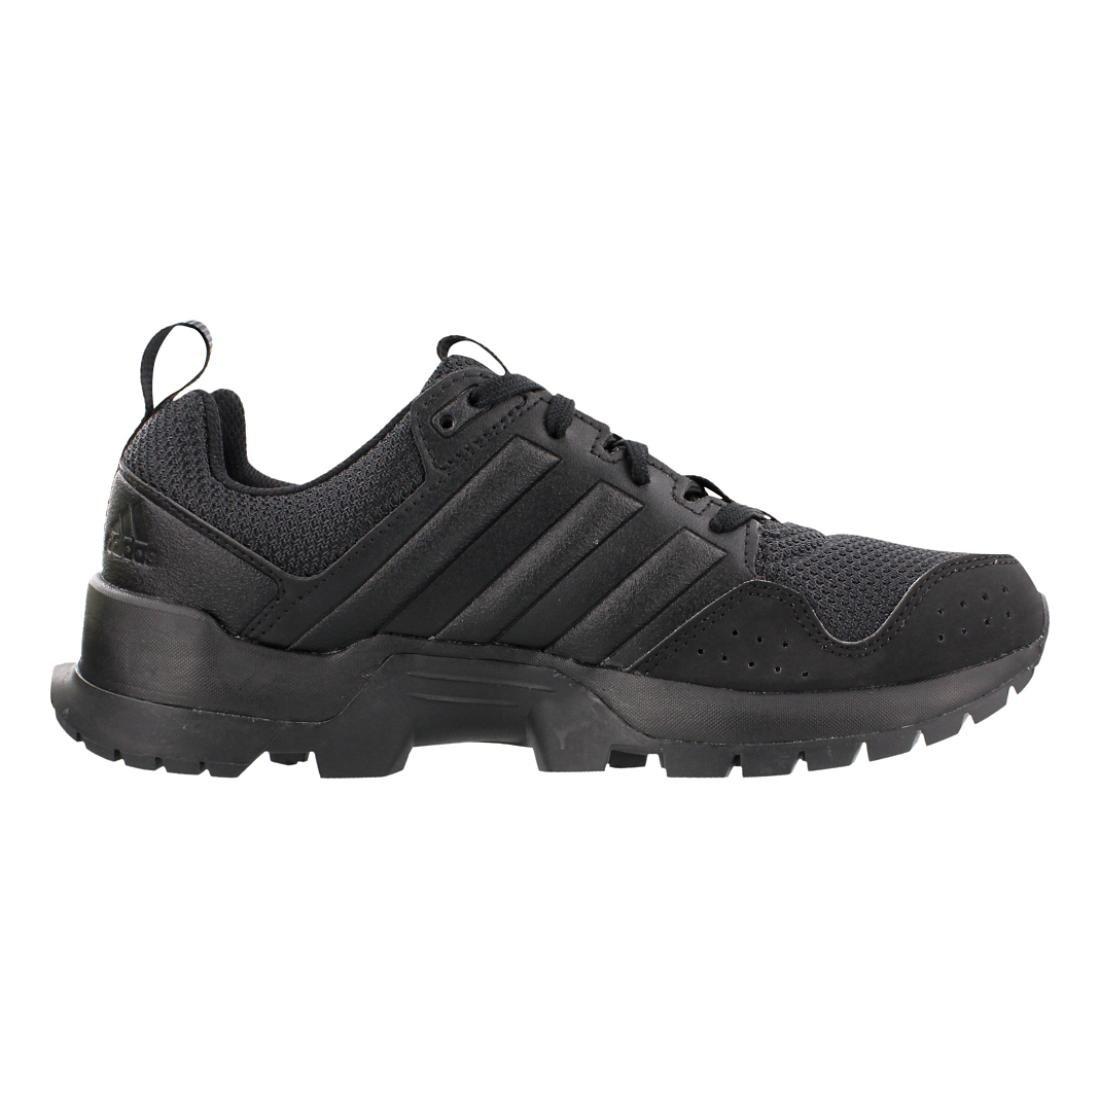 adidas outdoor Women's Gsg9 Trail Running Shoe B0116E700G 11 B(M) US|Black/Black/Black